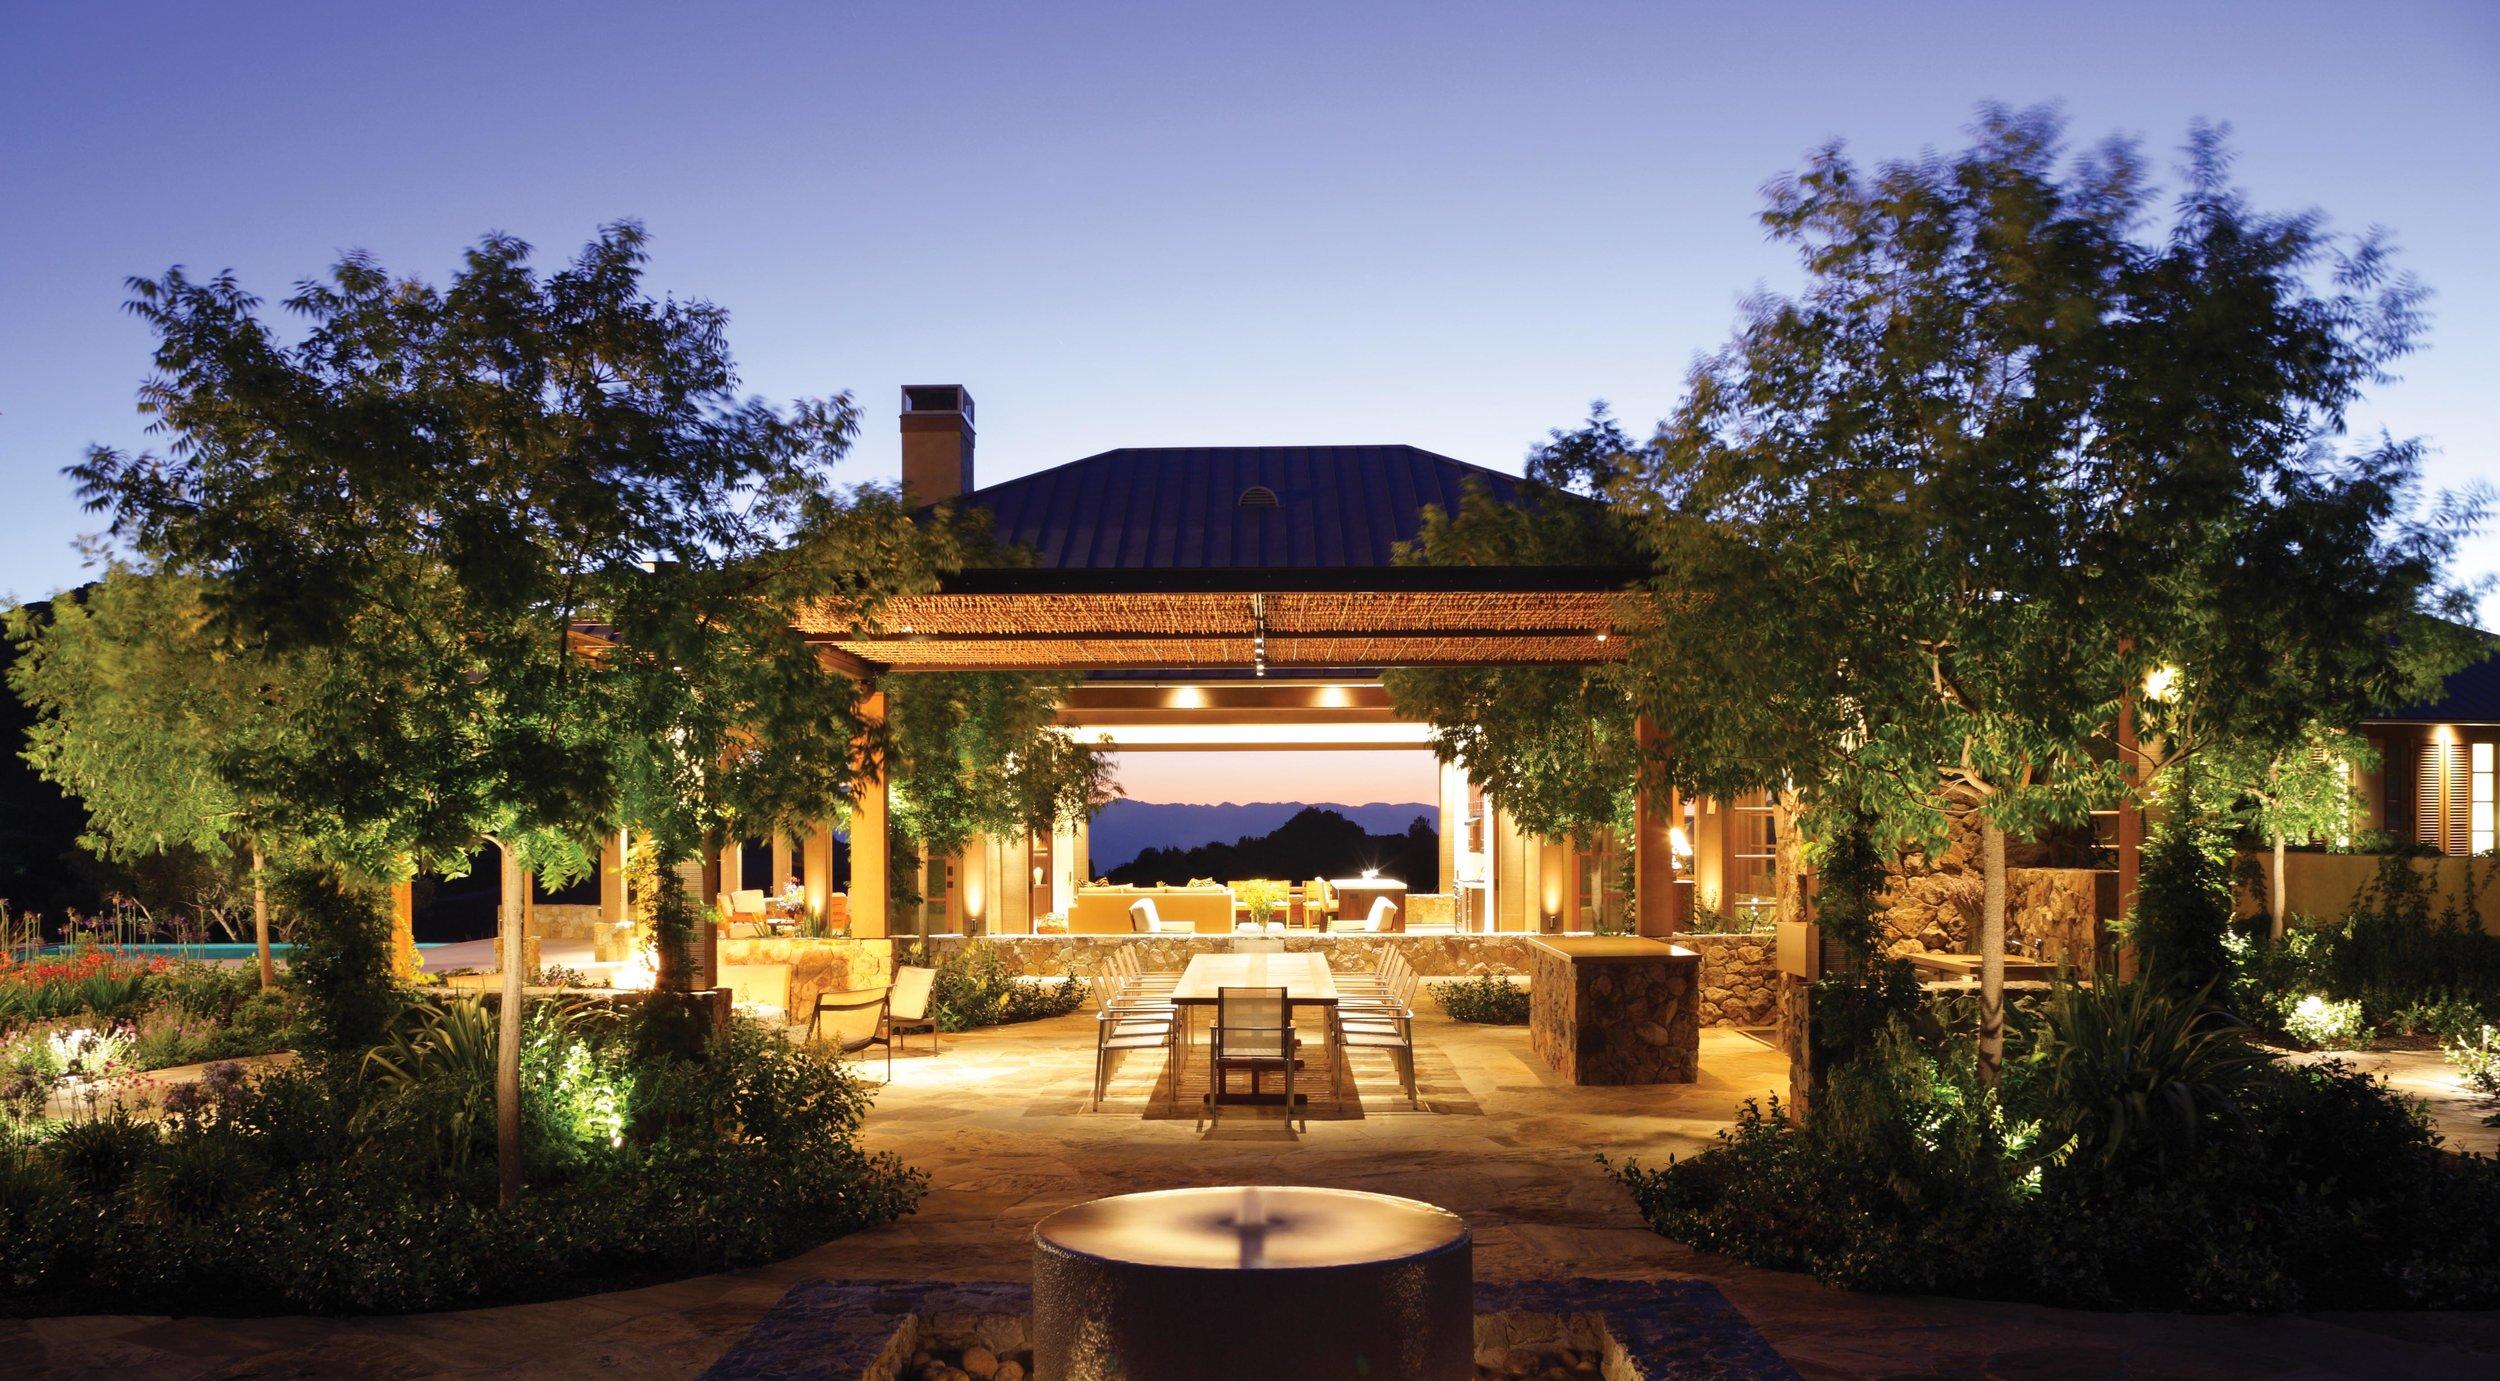 Soda Canyon Residence, Backen & Gillam Architects